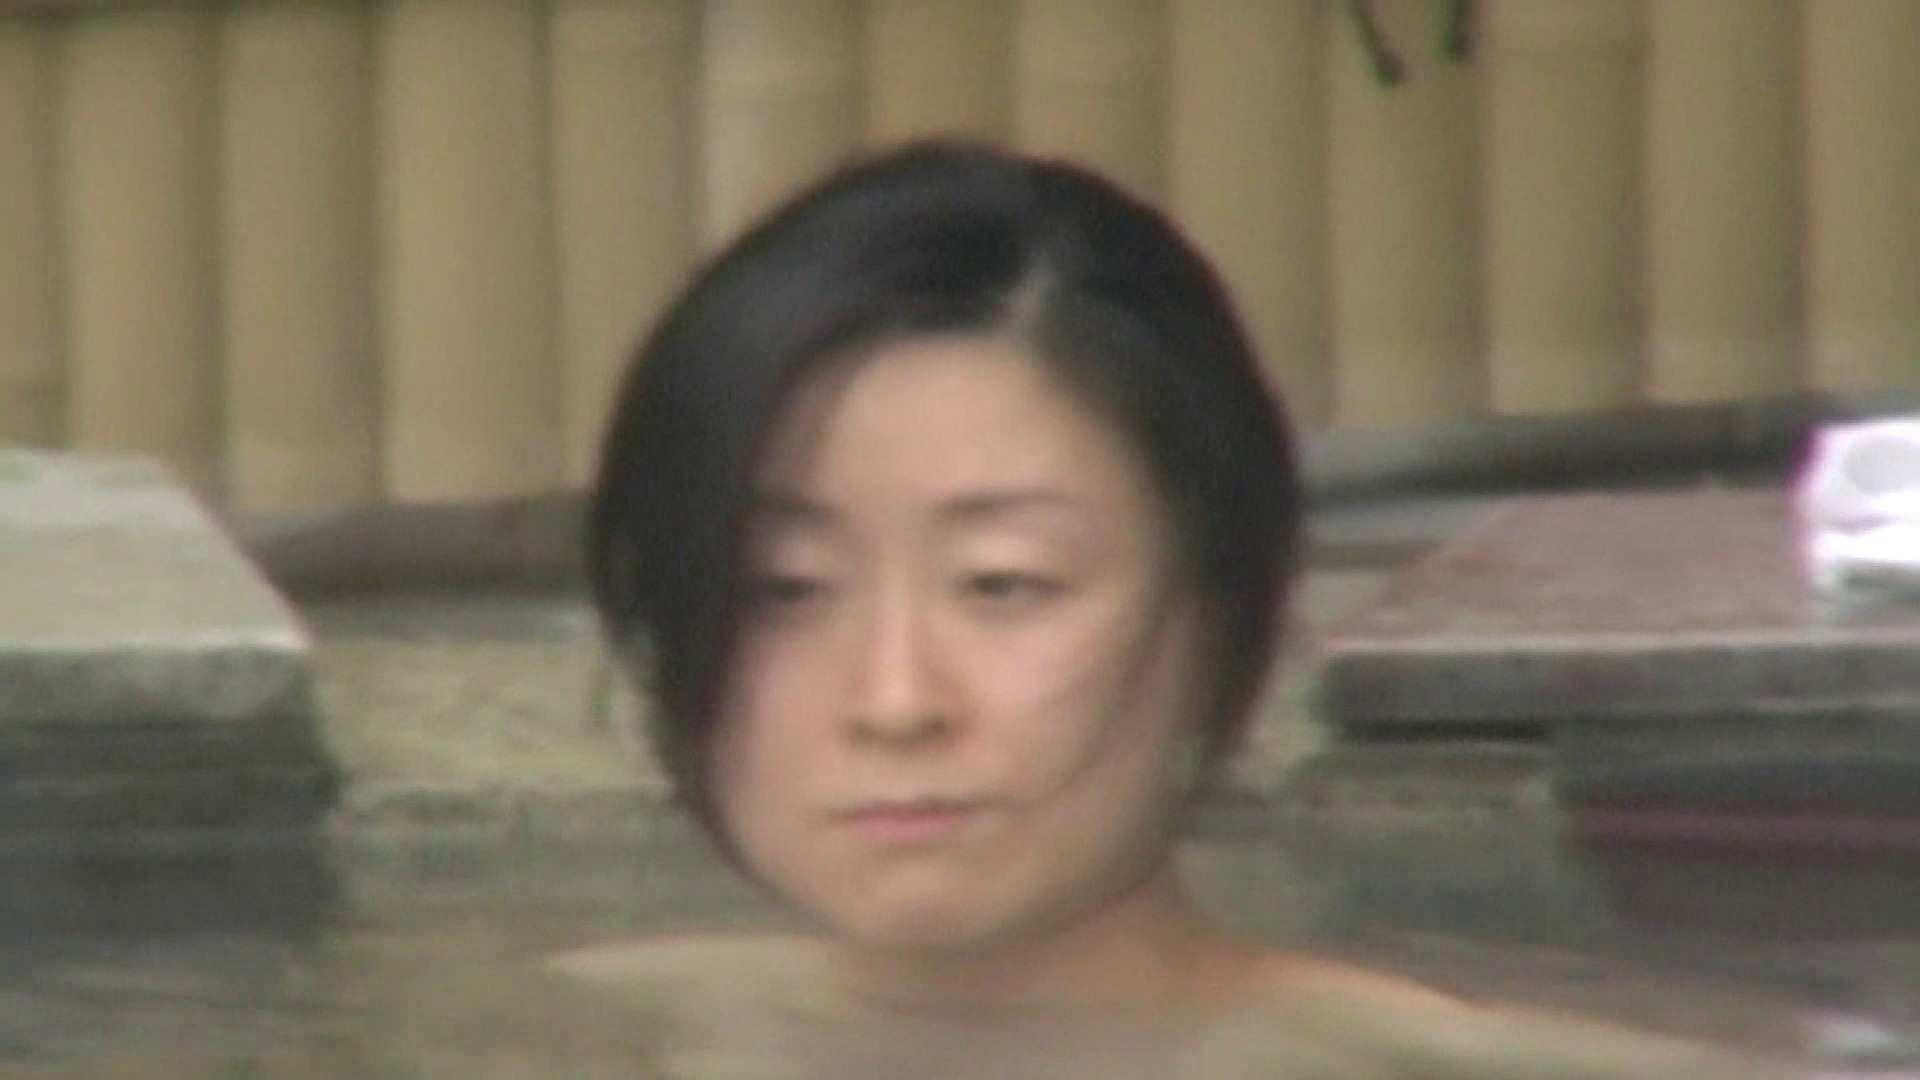 Aquaな露天風呂Vol.548 盗撮  97連発 20